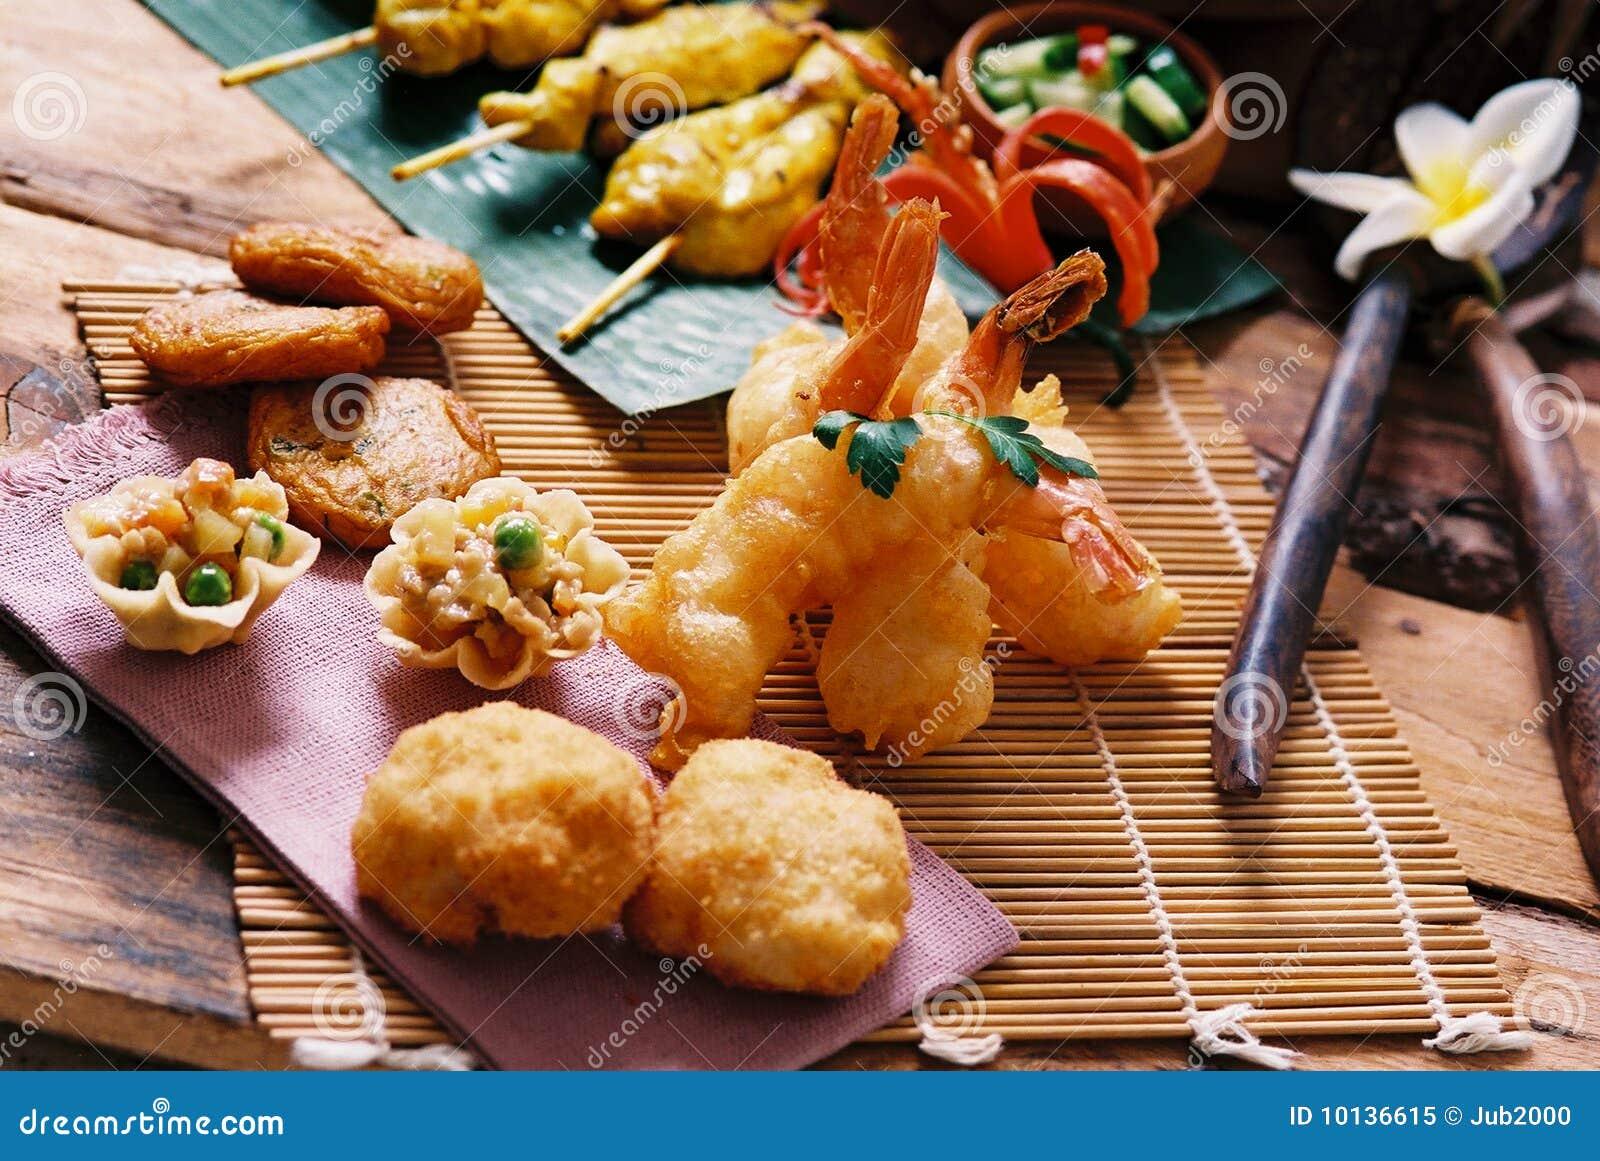 Thais voedsel - Voorgerecht